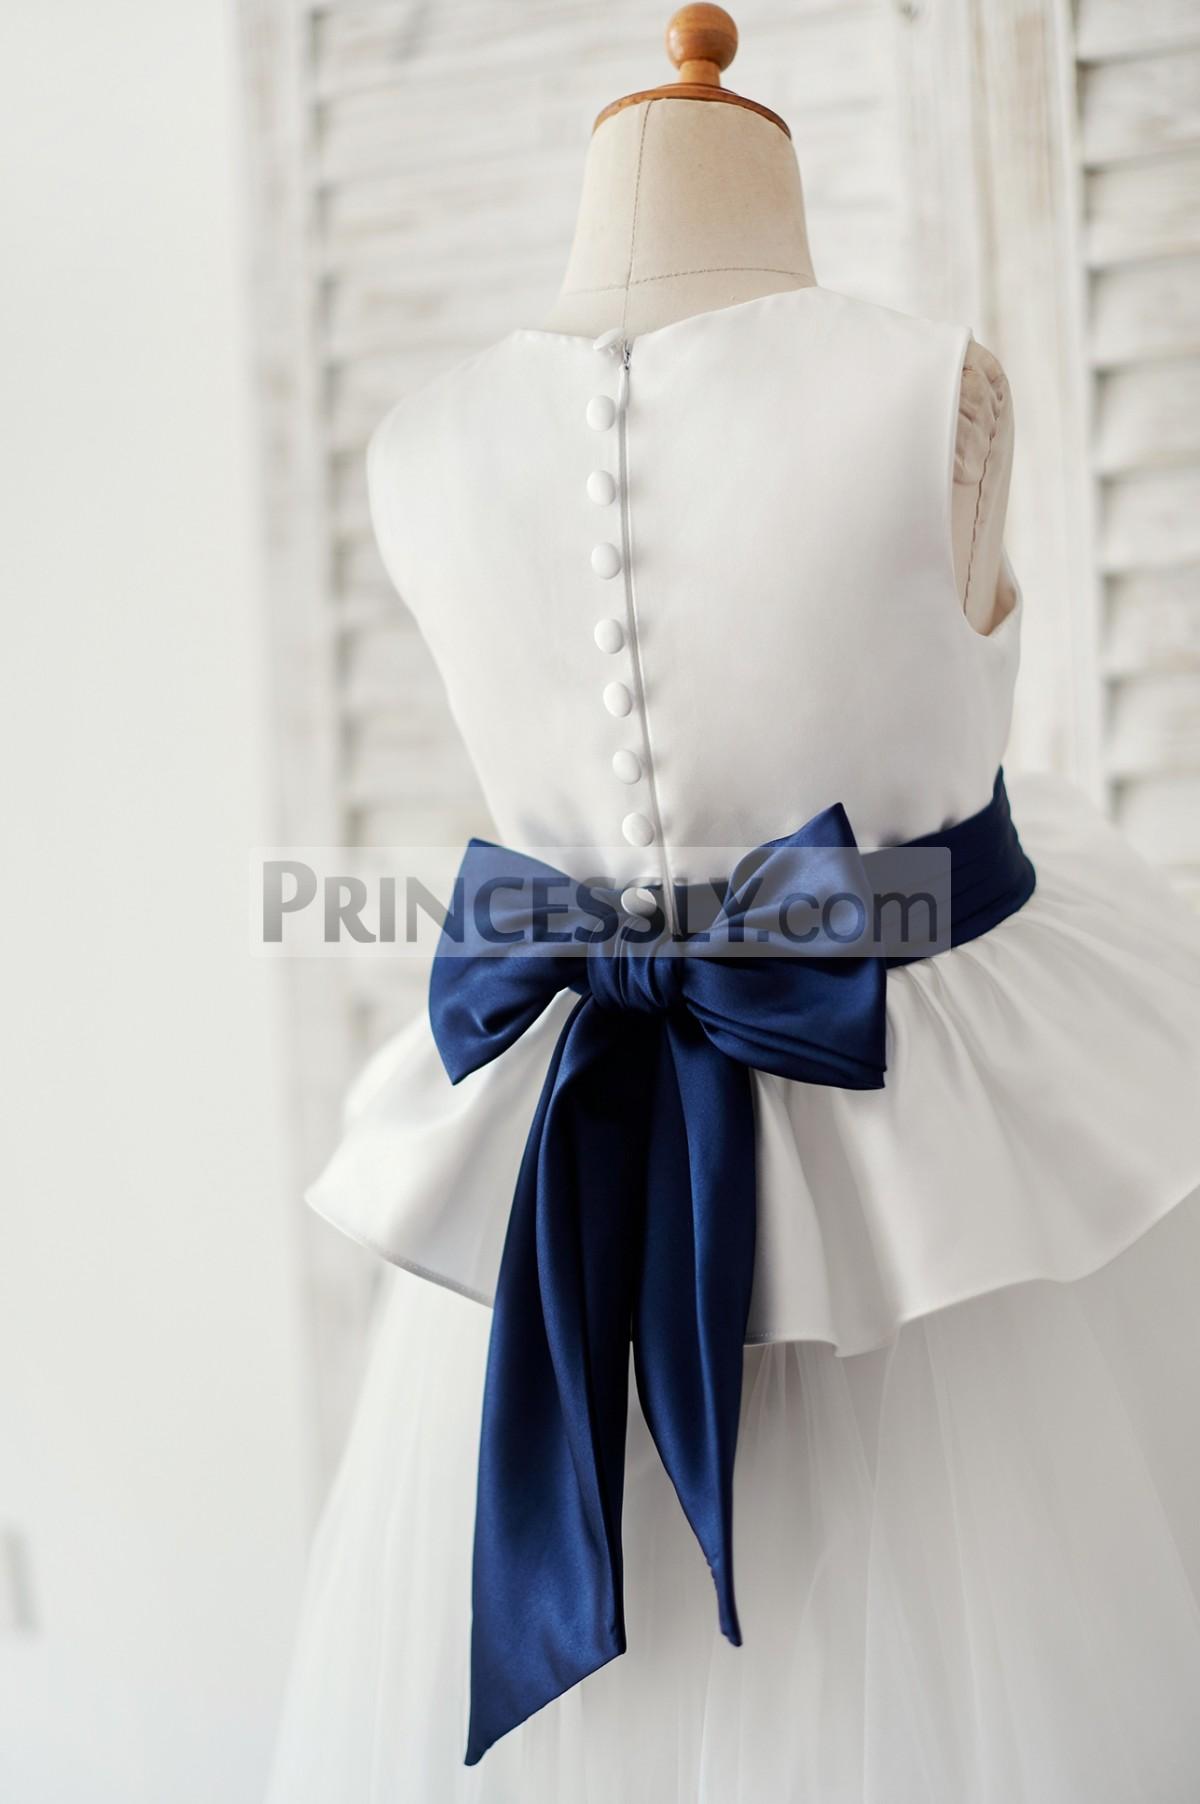 Cloth buttons along hidden zipper closure back with navy blue bow